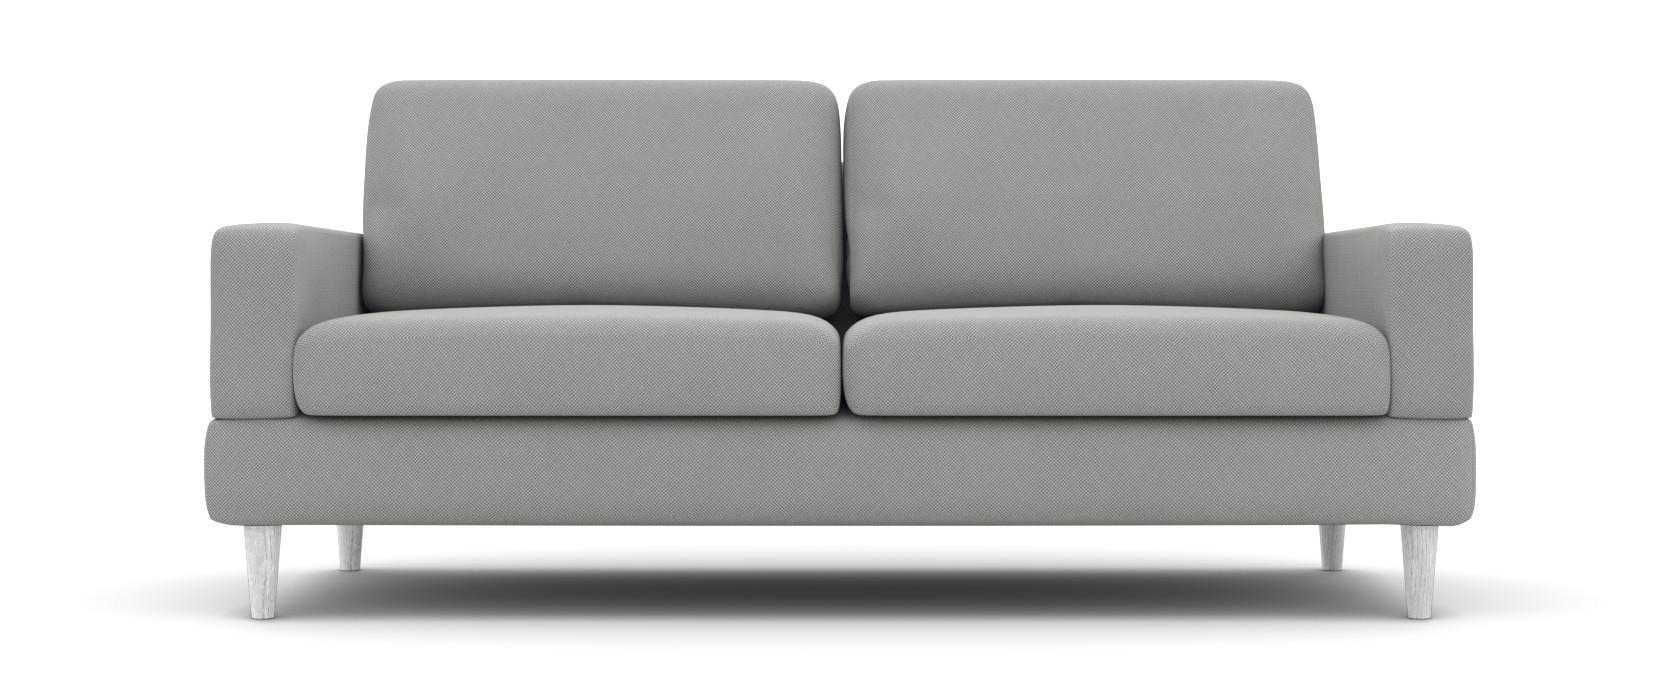 Full Size of 3 Sitzer Couch Ikea Sofa Und 2 Sessel Mit Federkern Schlaffunktion Poco Leder Bettfunktion Nockeby Mega Schlaf Liege Bezug Ecksofa Ottomane Relaxfunktion Sofa 3 Sitzer Sofa